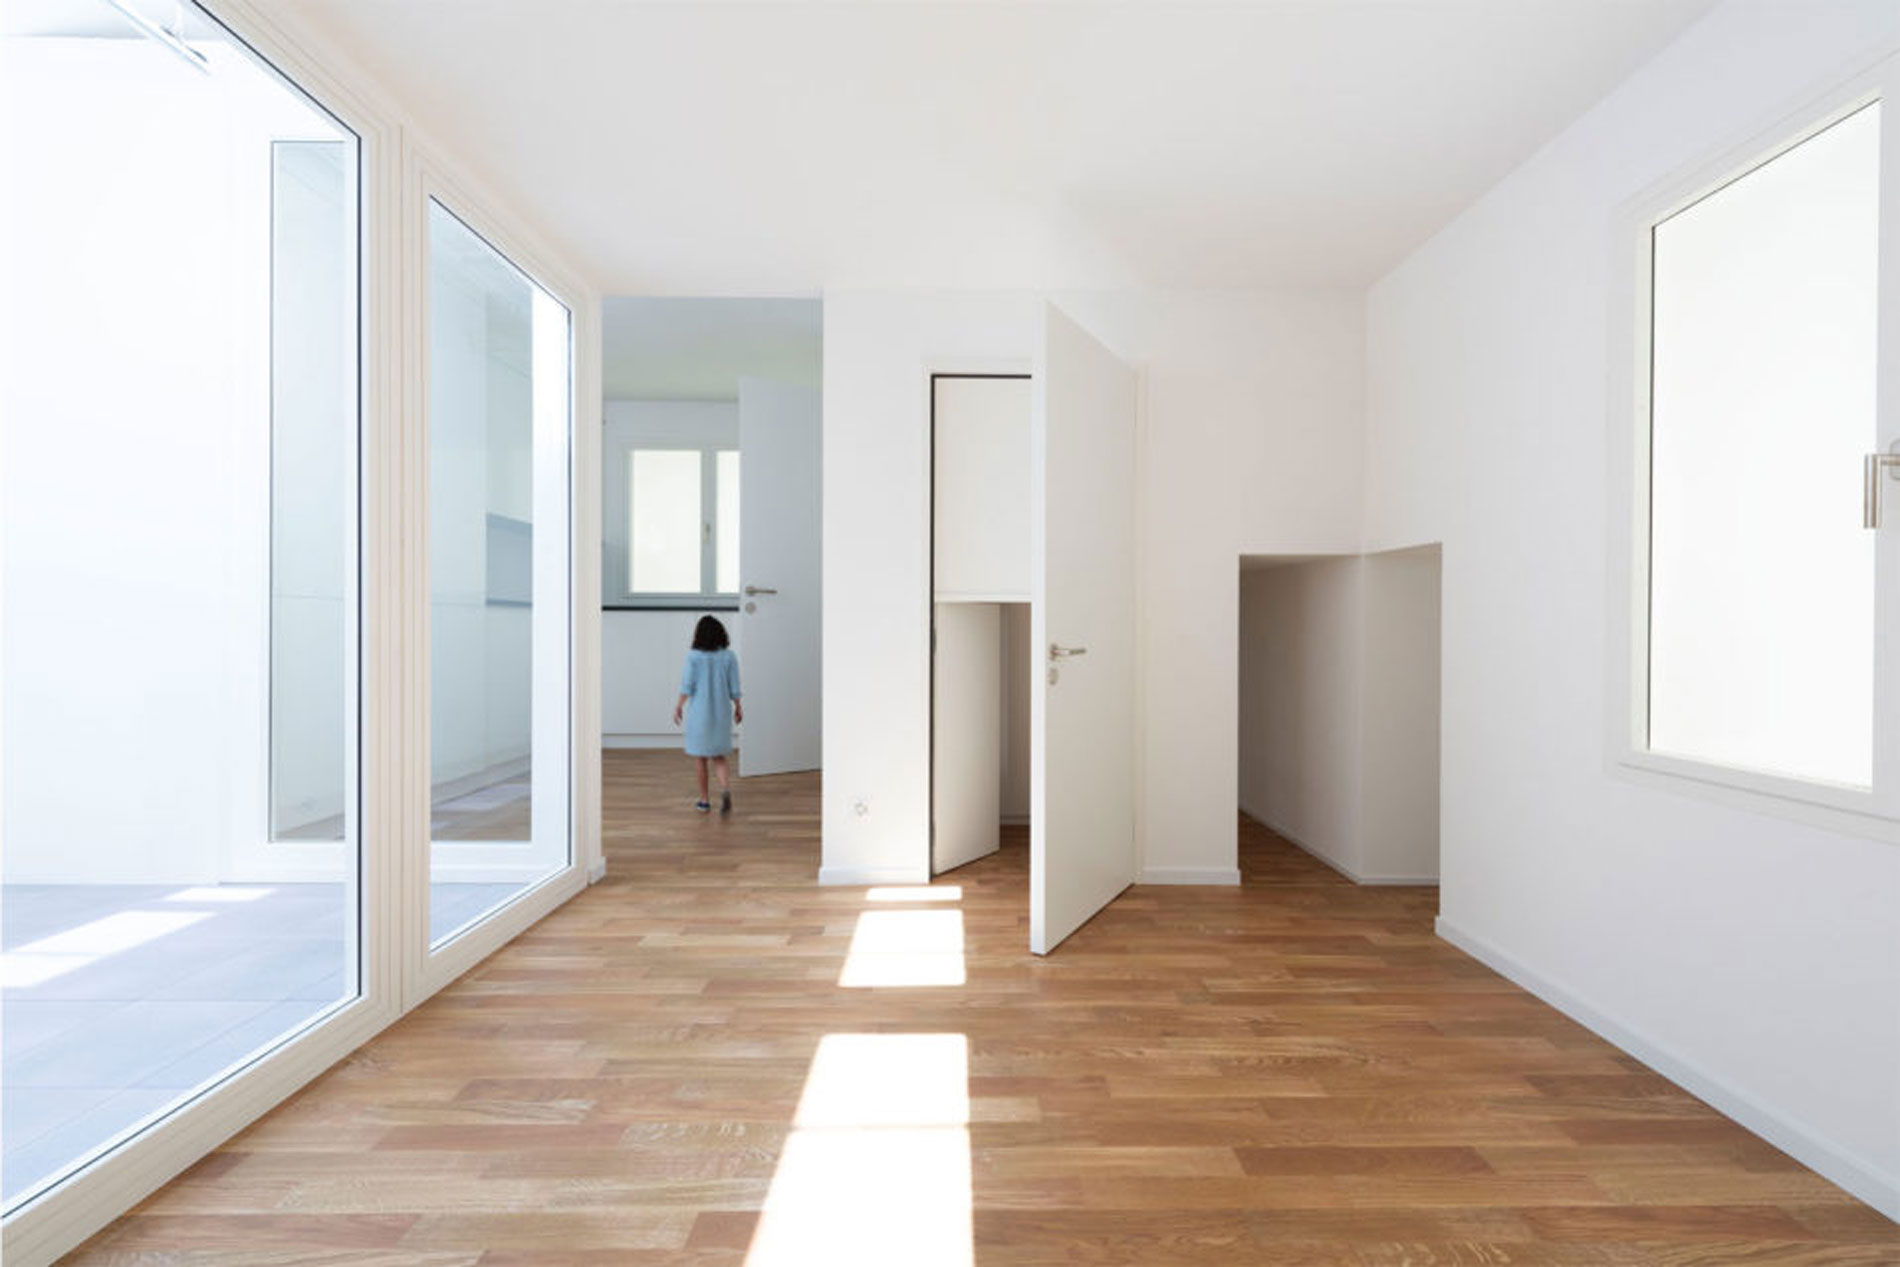 biennale architettura padiglione svizzera 240